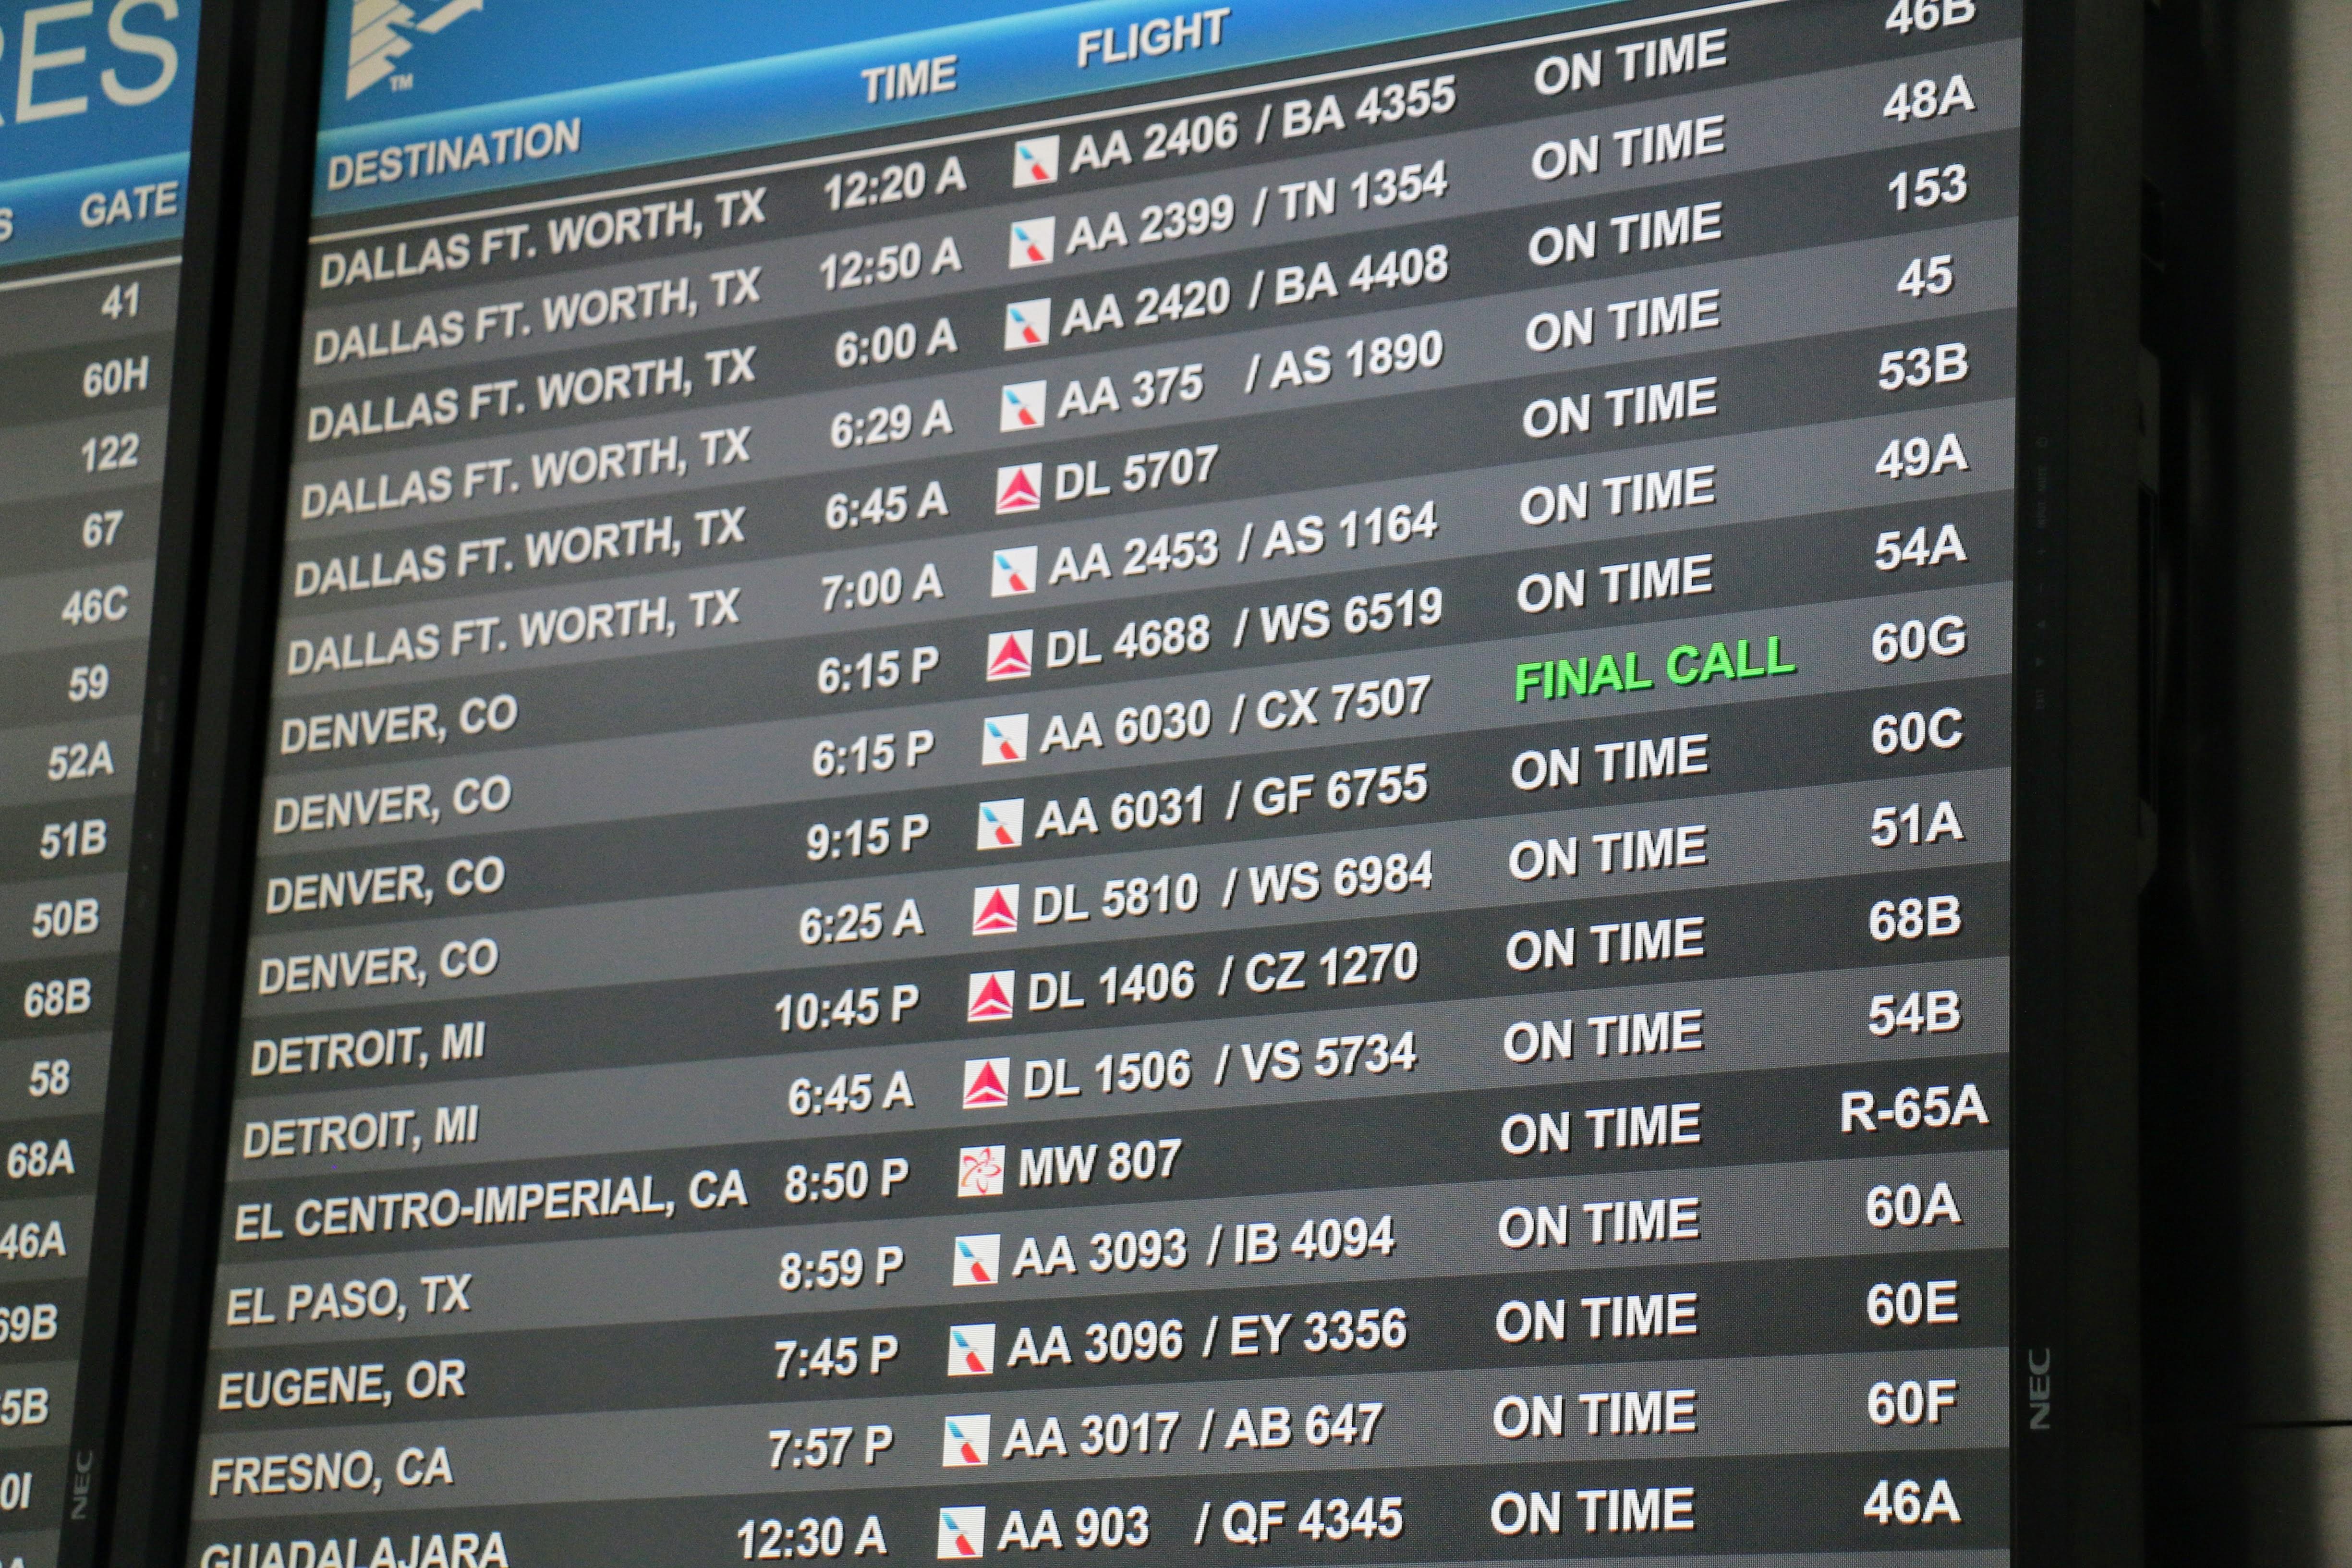 Yellowstone waar op vliegen?